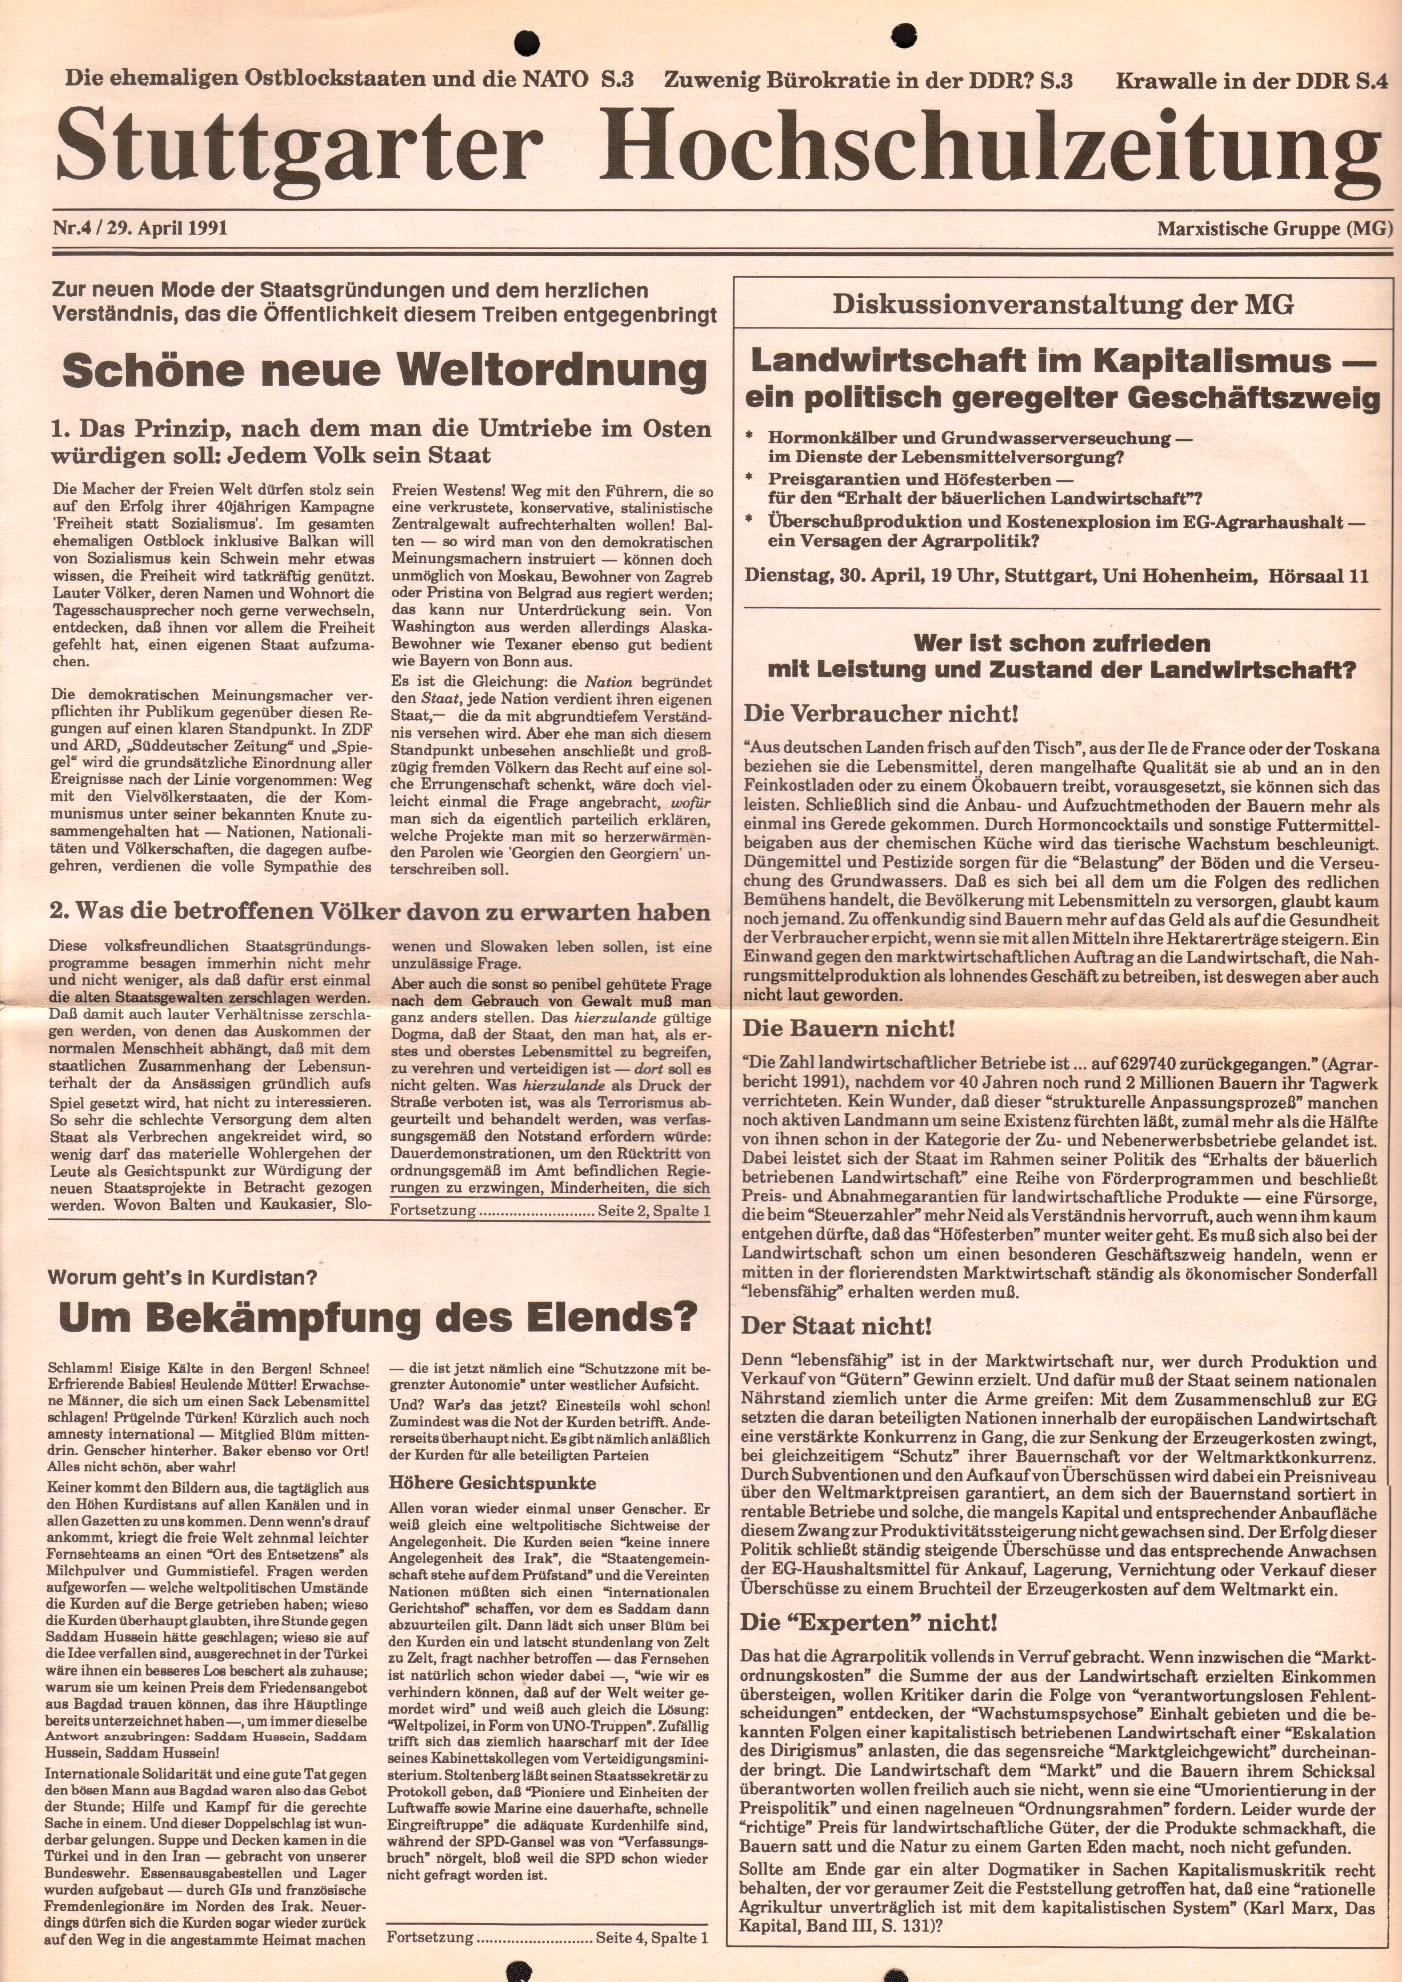 Stuttgart_MG_Hochschulzeitung_1991_04_01